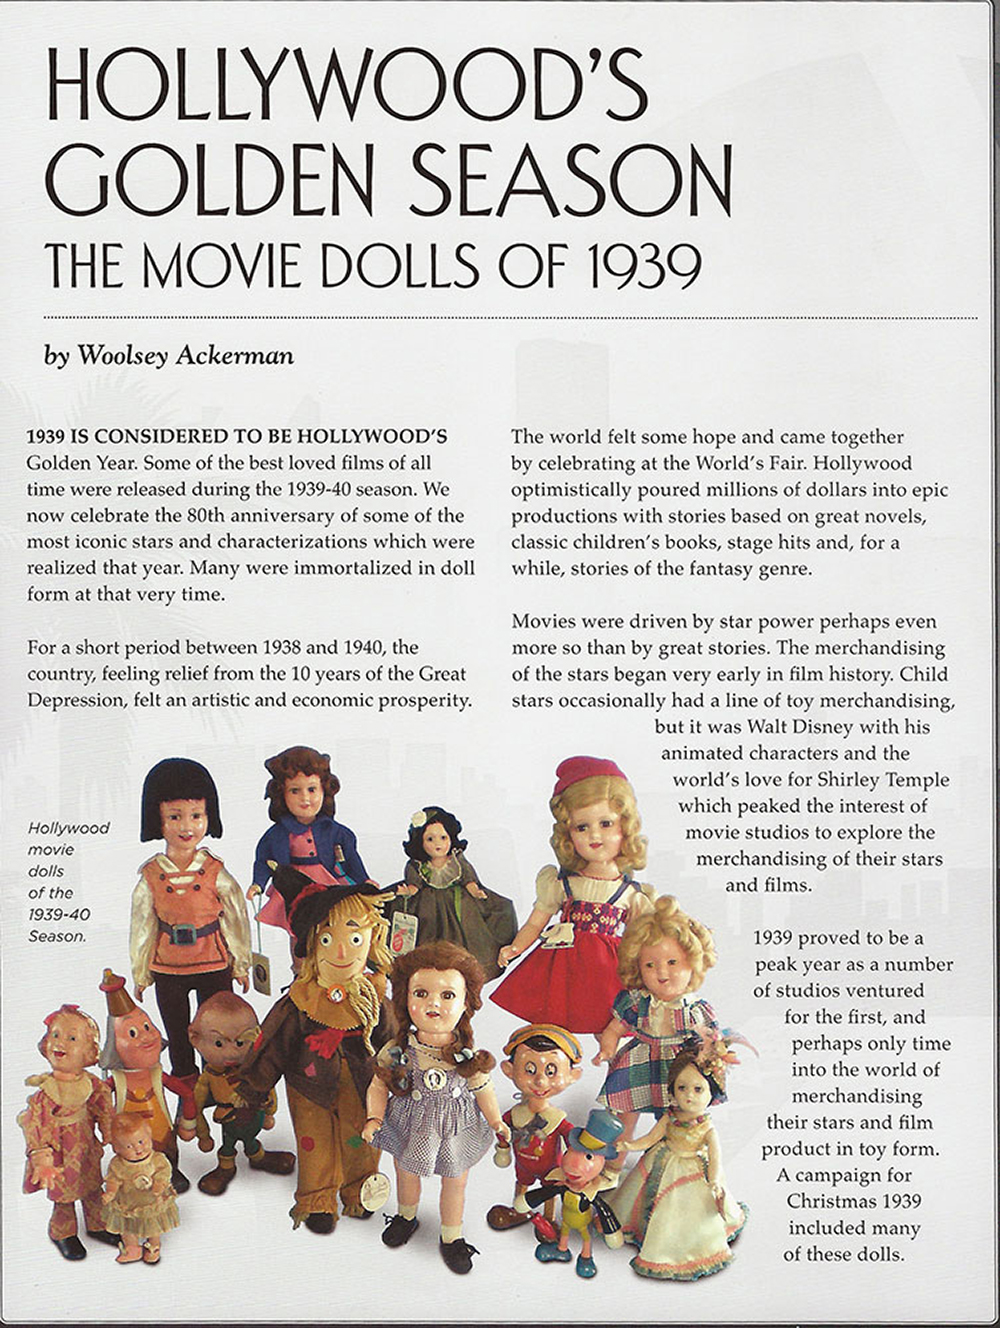 Hollywoods Golden Season - 1938 Hollywood Dolls